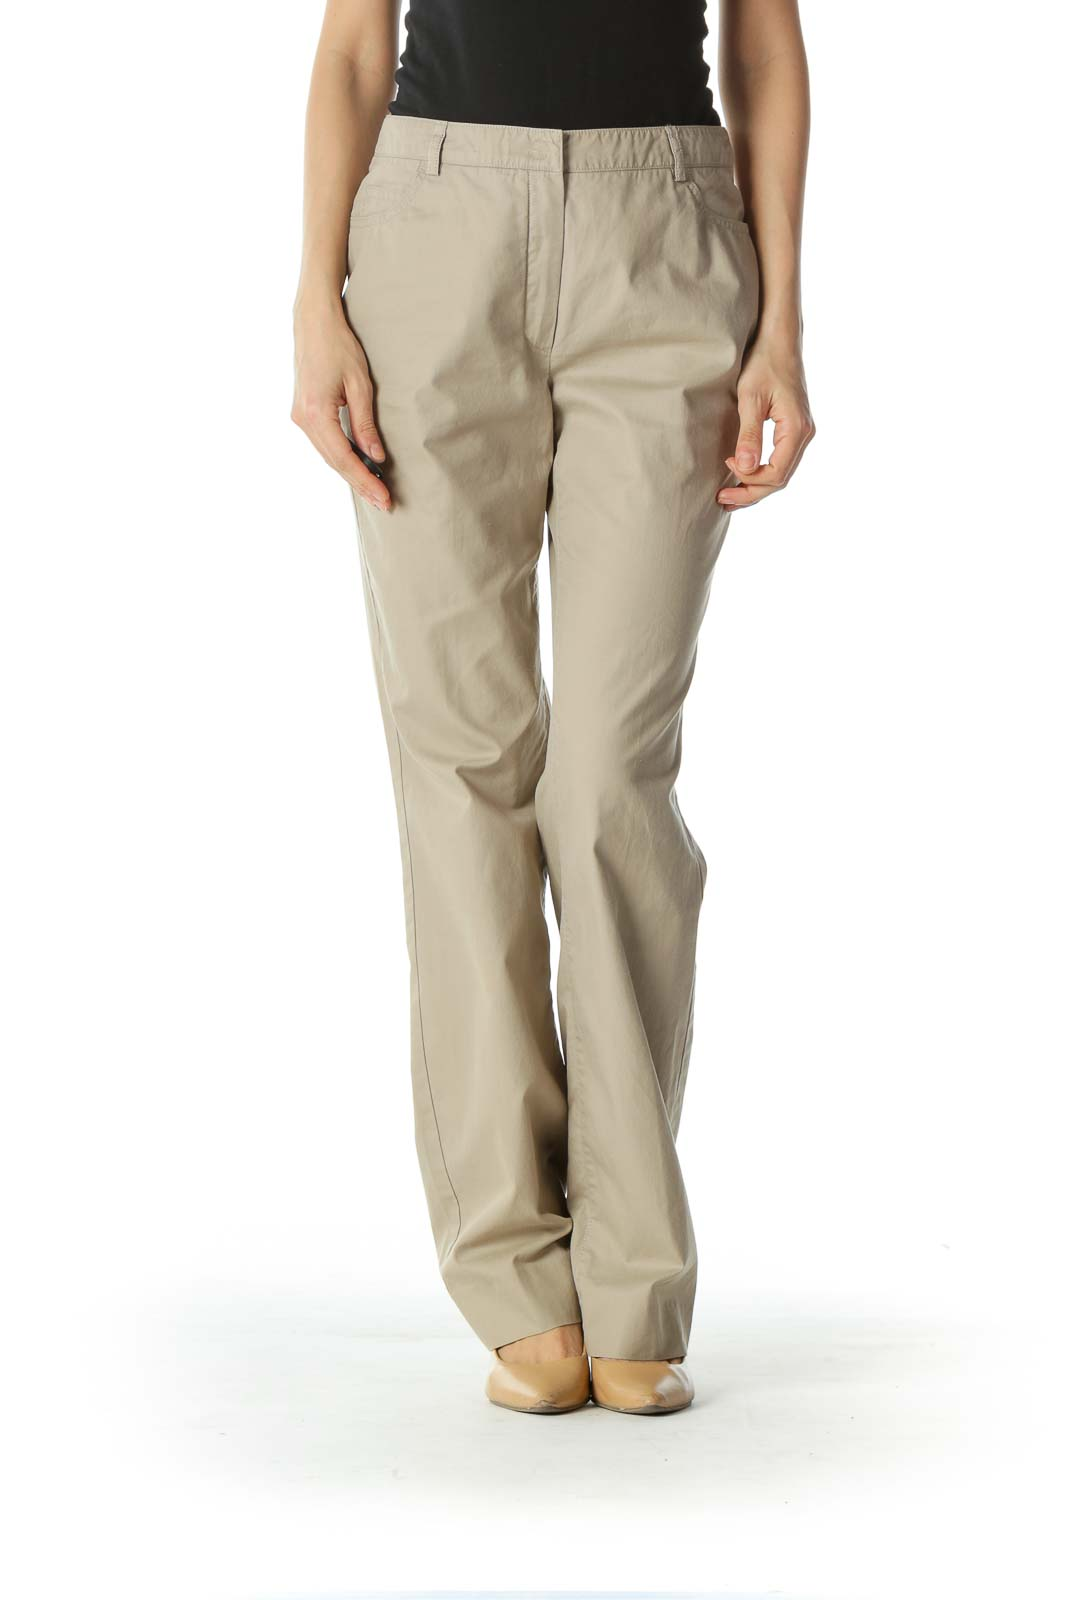 Beige Mid-Waist Designer Khaki Pant Front